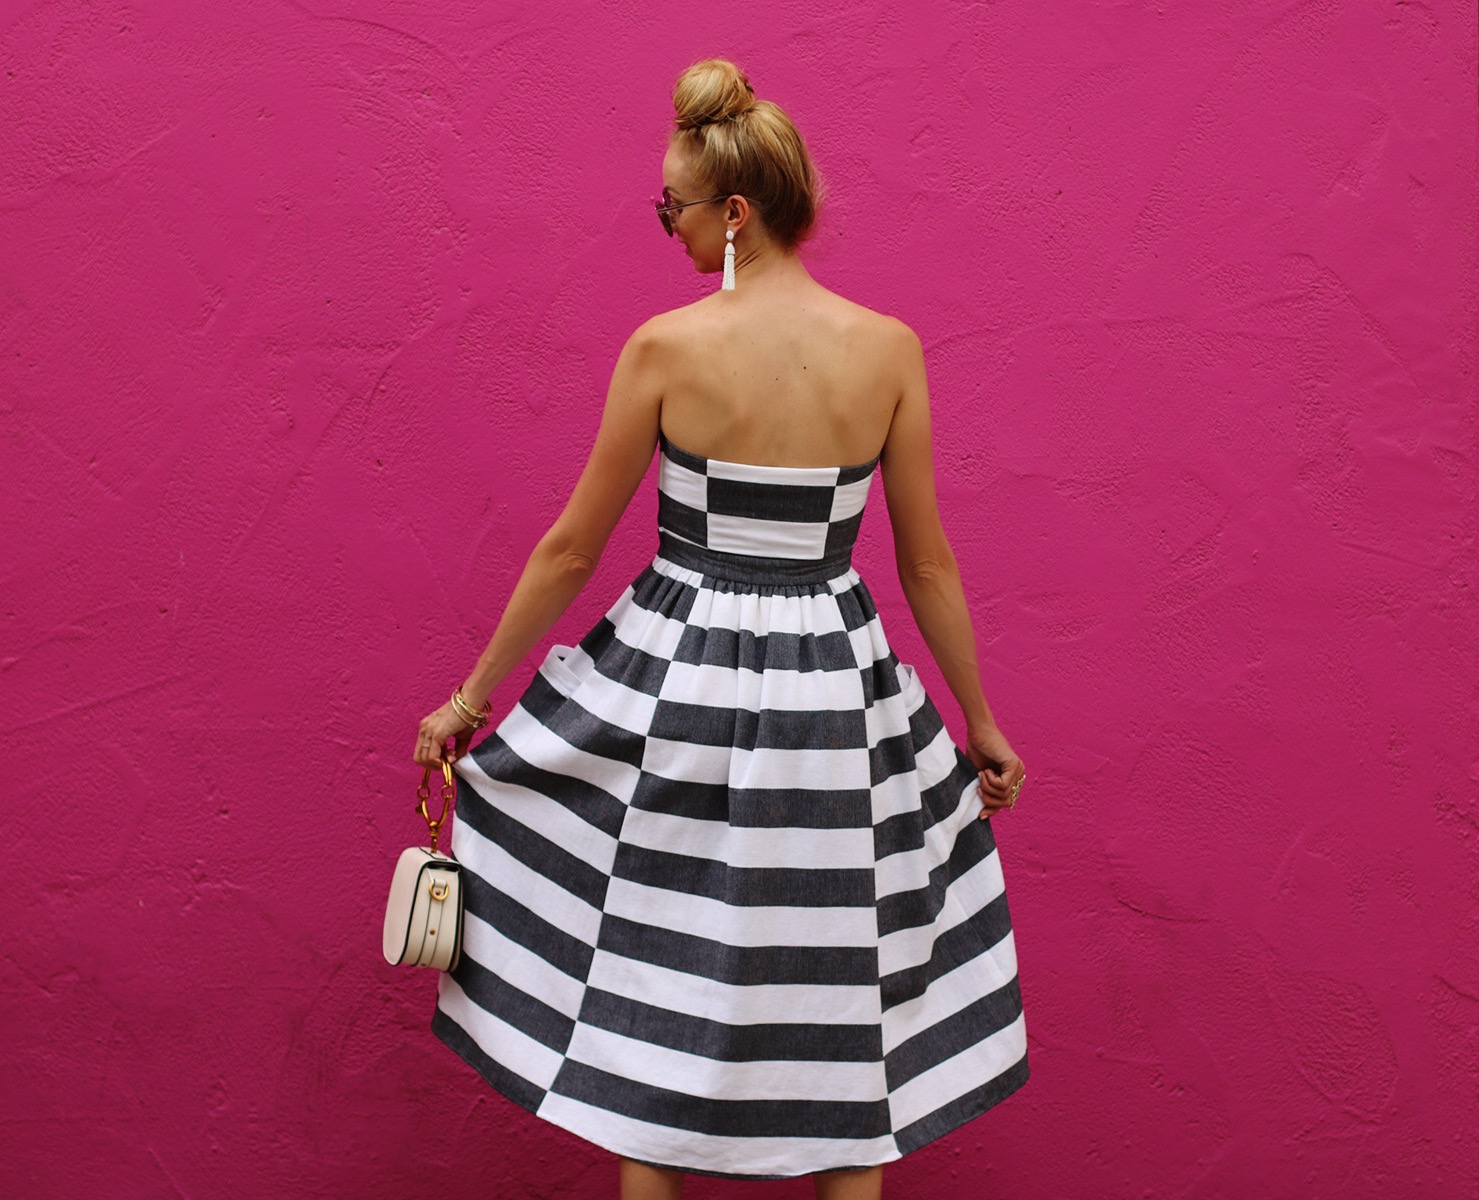 mara-hoffman-striped-dress-free-people.jpg